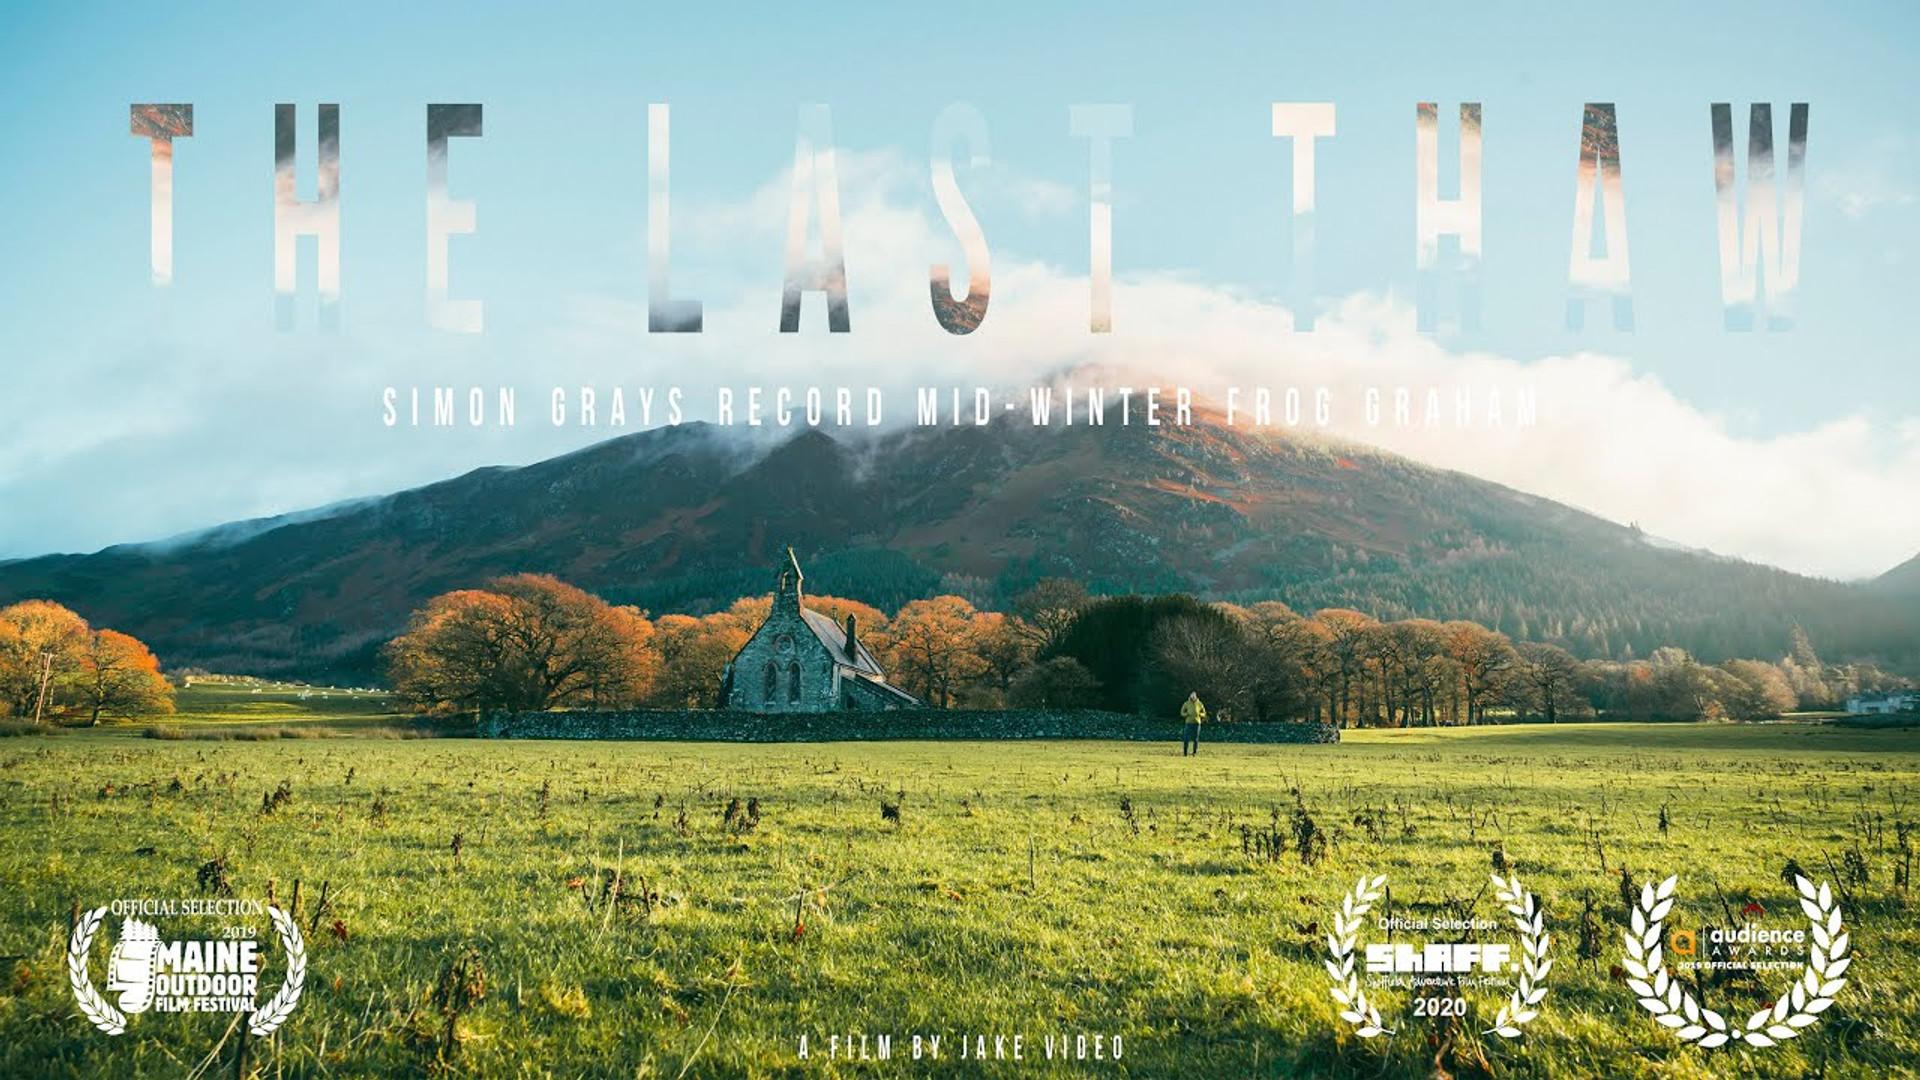 'The Last Thaw' Simon Gray's Mid-Winter Frog Graham Record